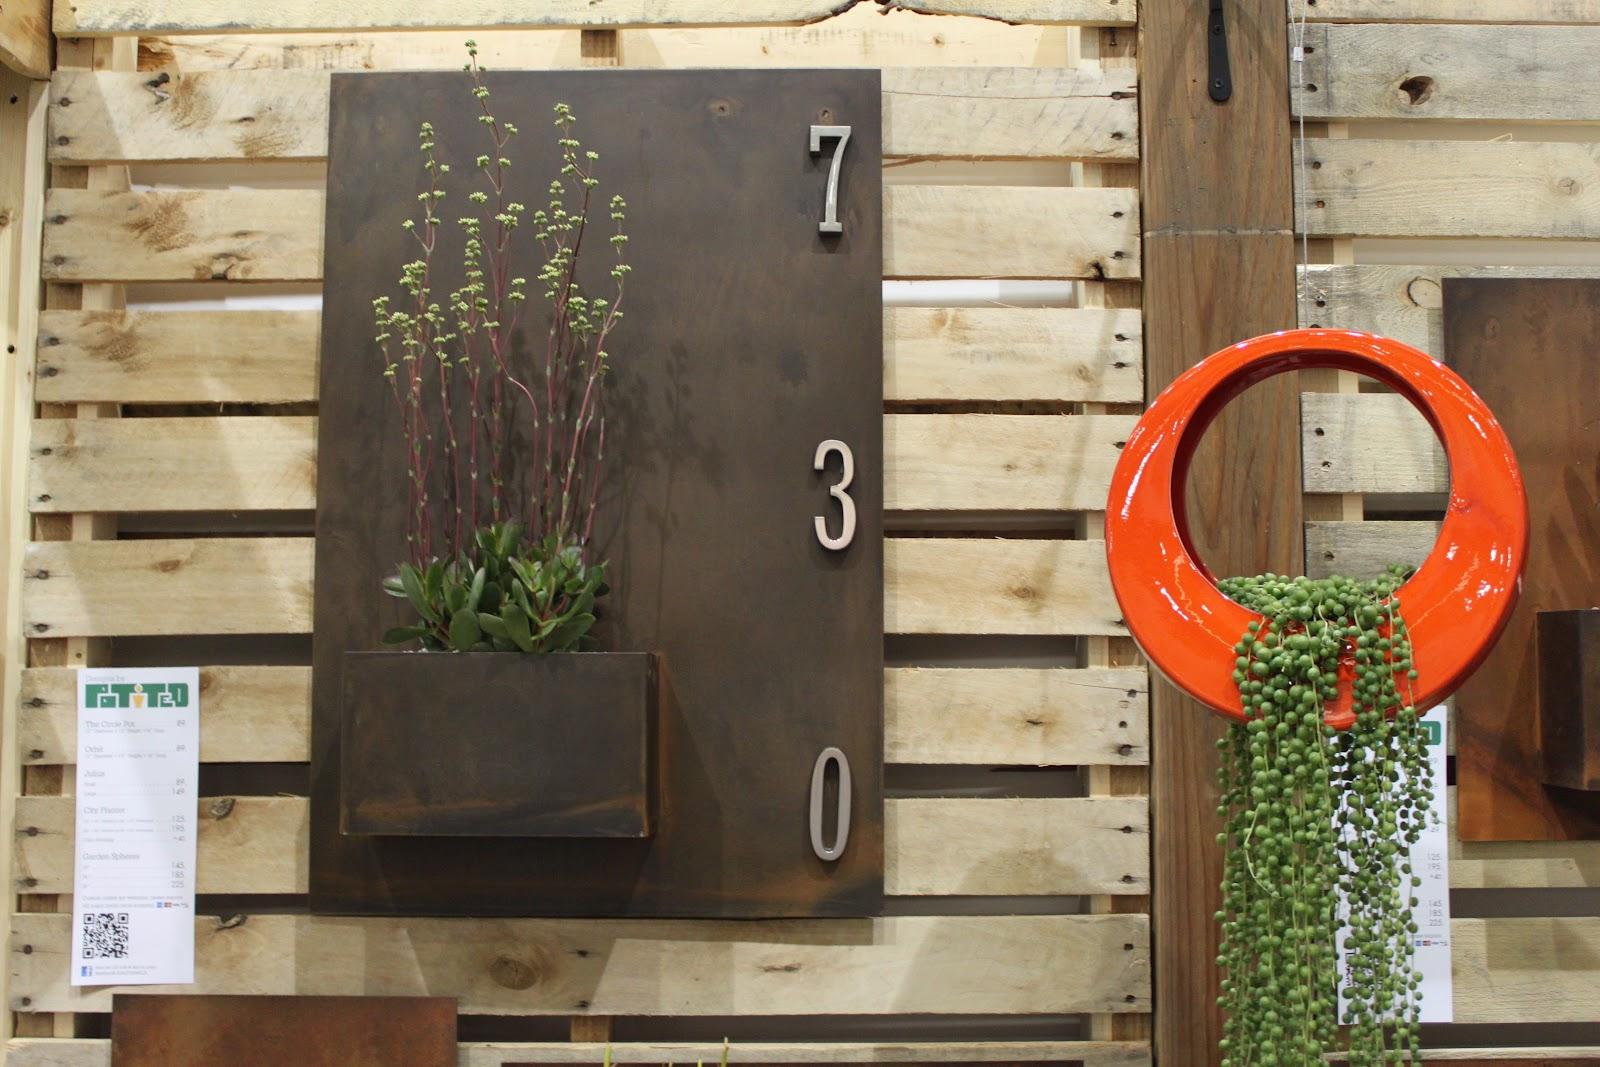 dwell on design - landscape idea #2 modern wall planters ...